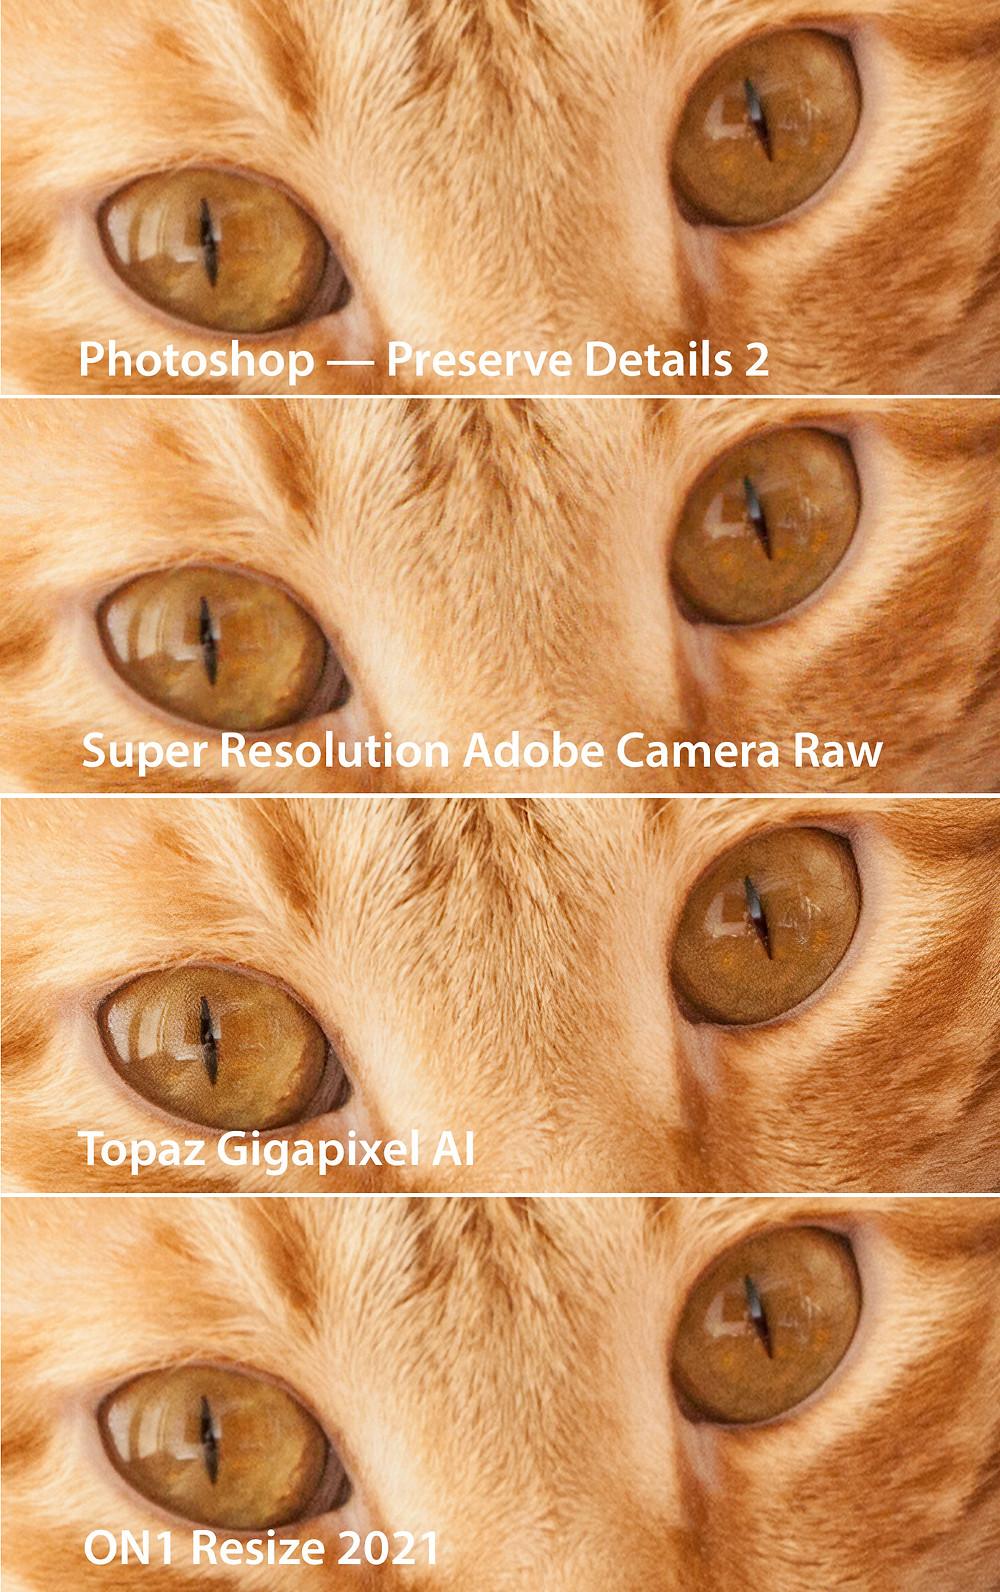 Super Resolution Adobe Camera Raw, Topaz Gigapixel AI, Photoshop — Preserve Details 2, ON1 Resize 2021